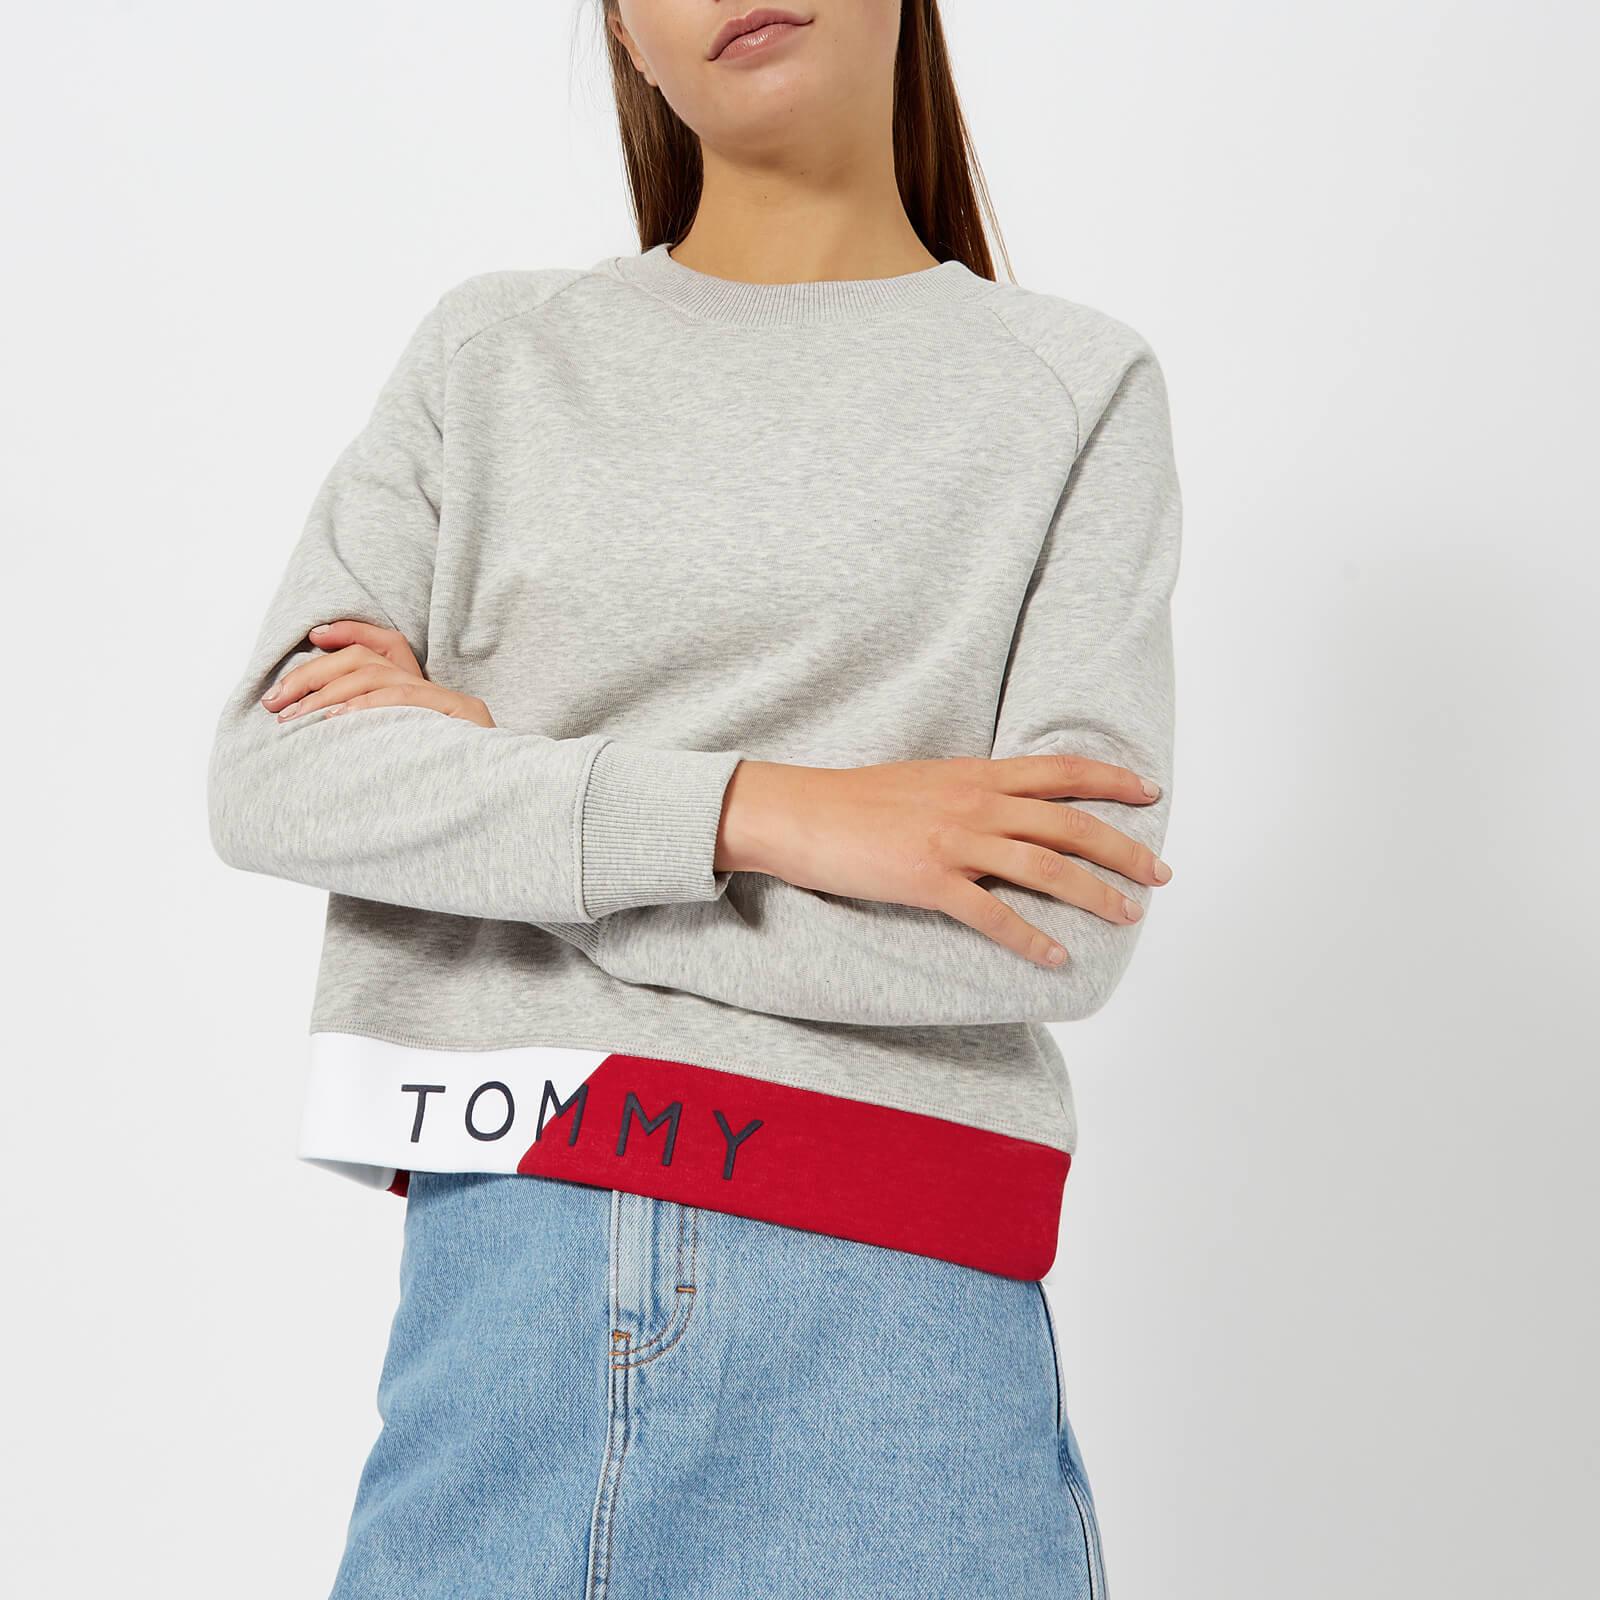 d5d5bbf231c3 Tommy Hilfiger Women s Athleisure Electra Sweatshirt - Light Grey Womens  Clothing